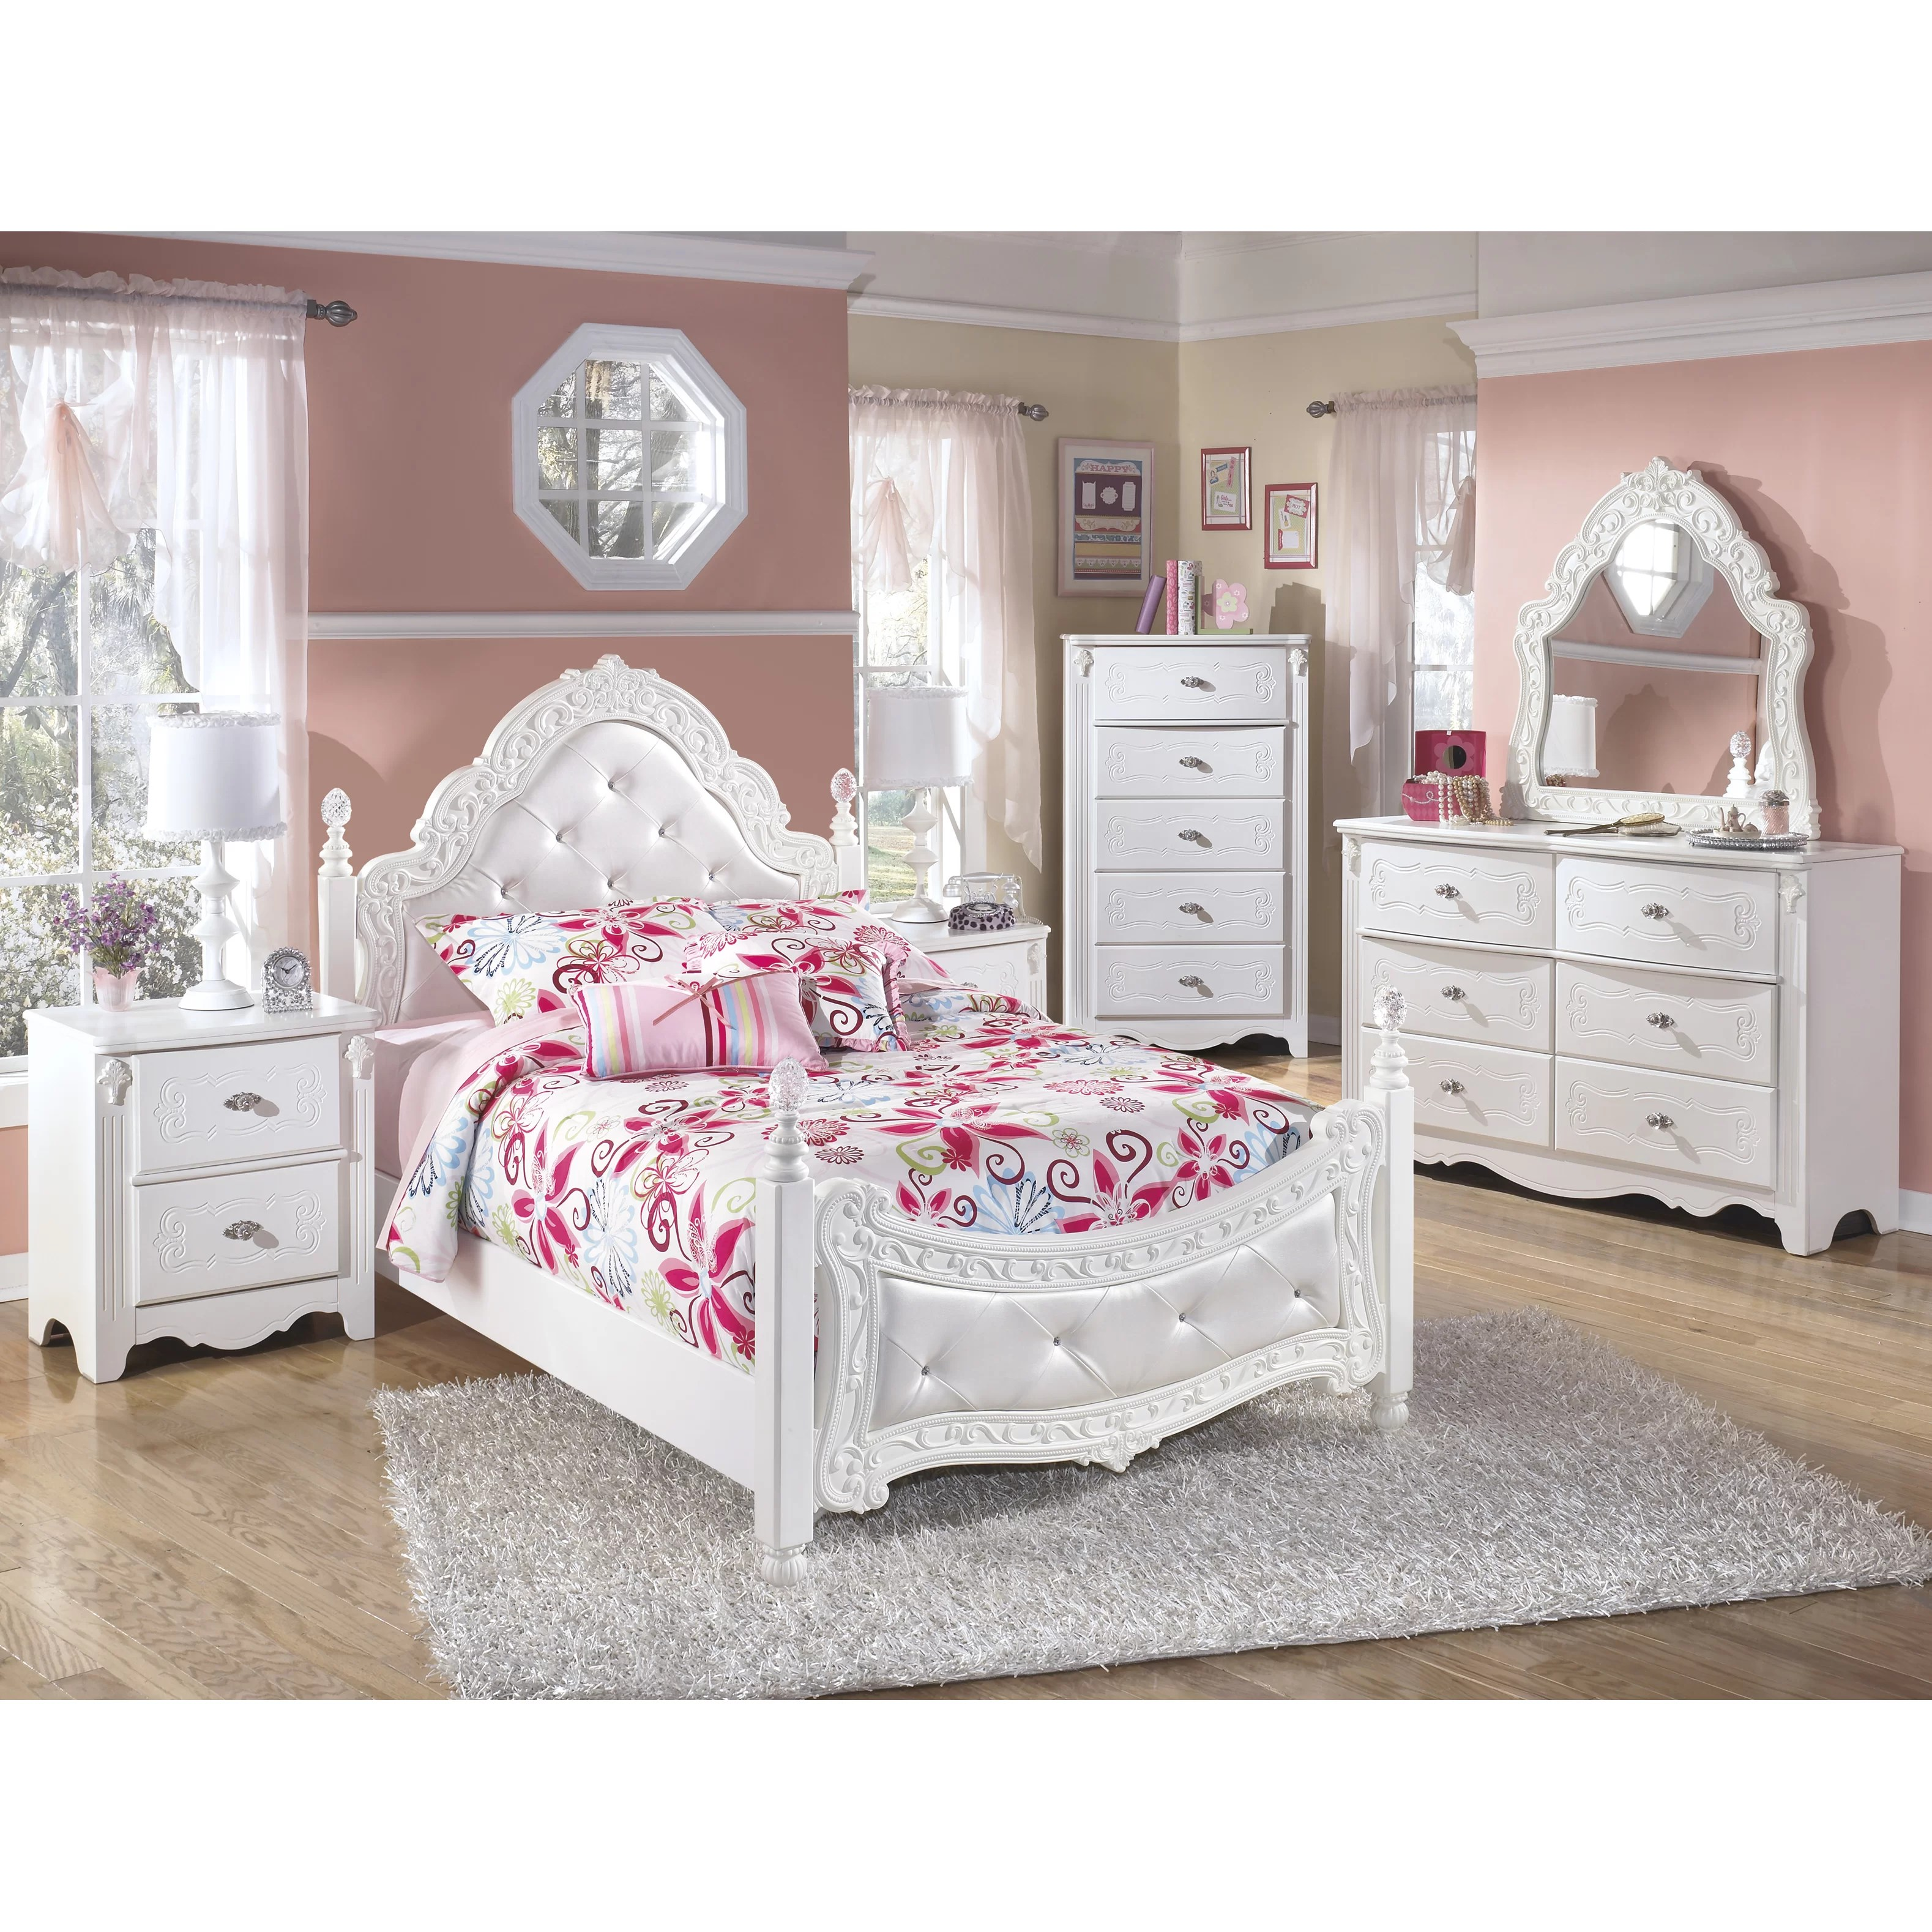 Signature Design by Ashley Exquisite Four Poster Customizable Bedroom Set  Reviews  Wayfair